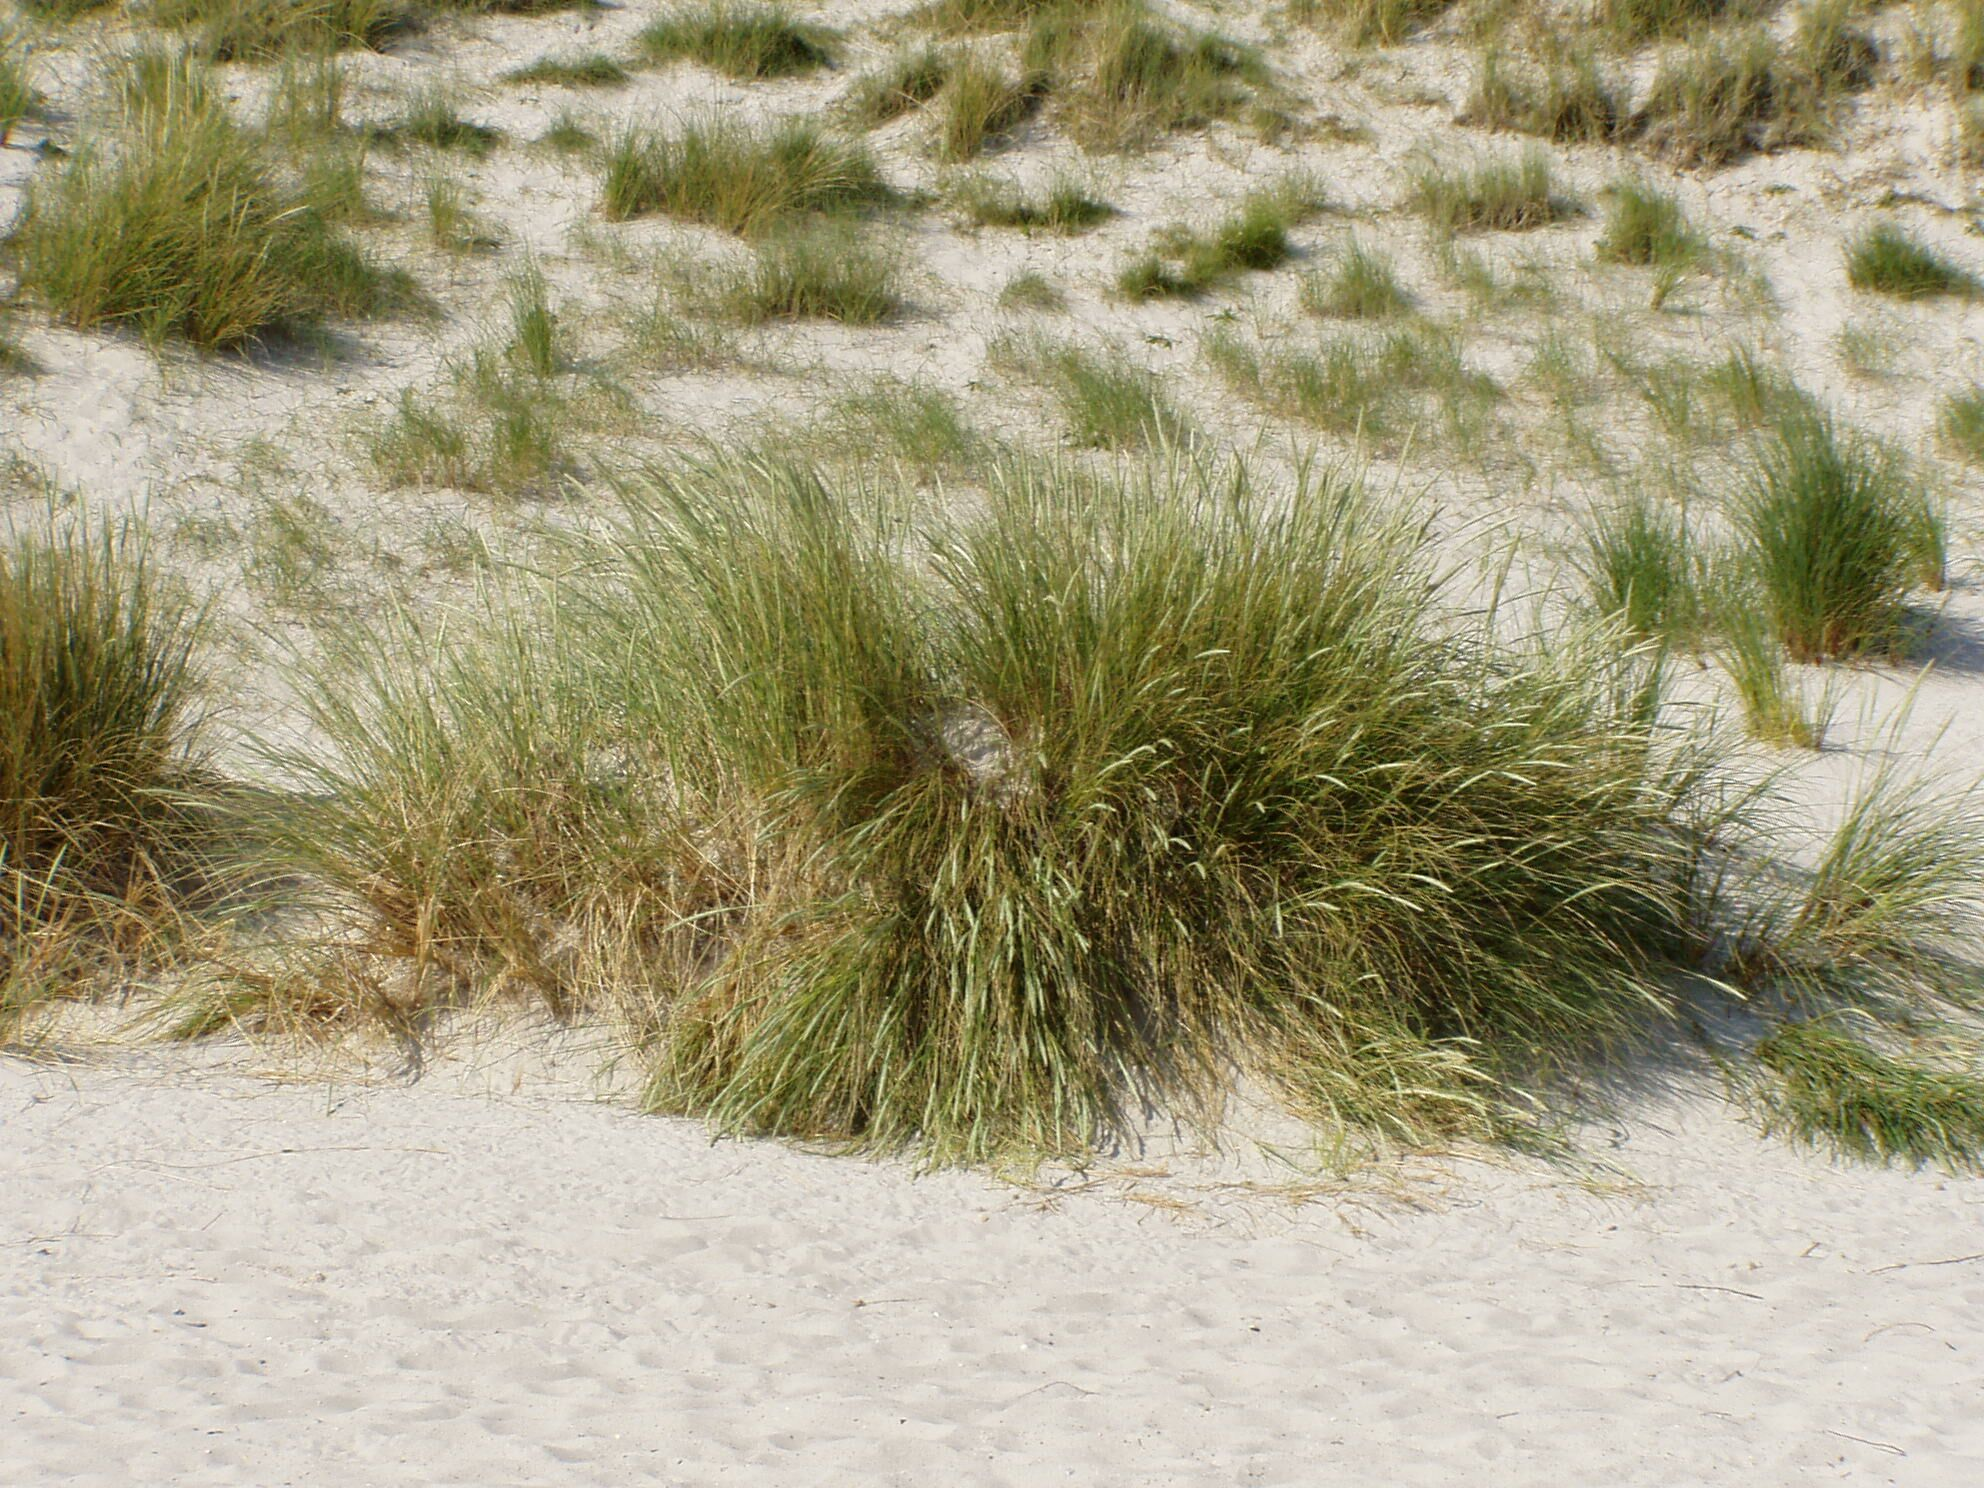 foto de File:Ammophila arenaria auf Düne4Wikimedia Commons